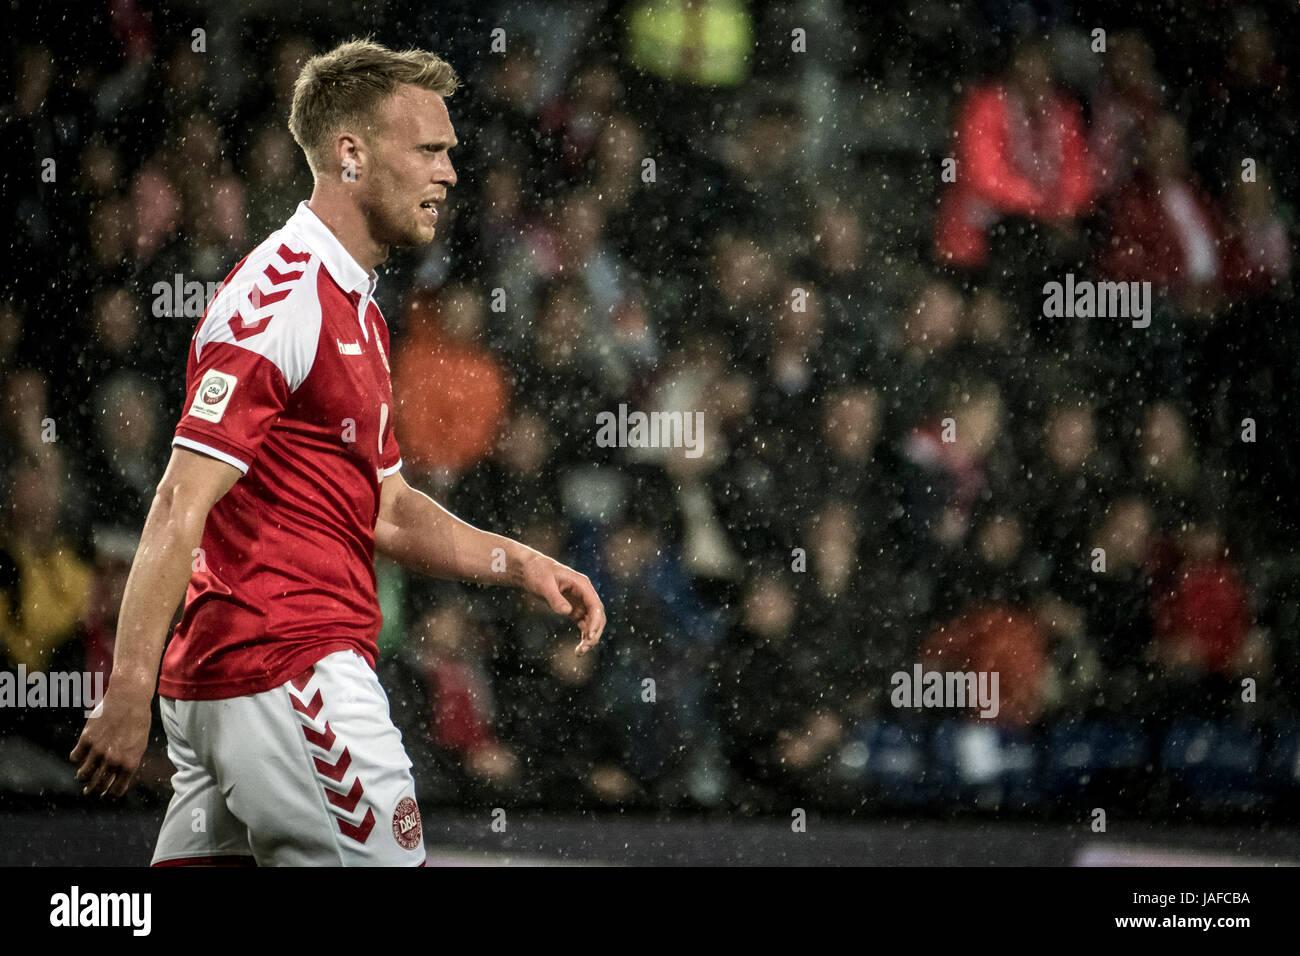 Brondby, Denmark. 6th Jun, 2017. Nicolai Jorgensen (9) of Denmark seen during the football friendly between Denmark - Stock Image